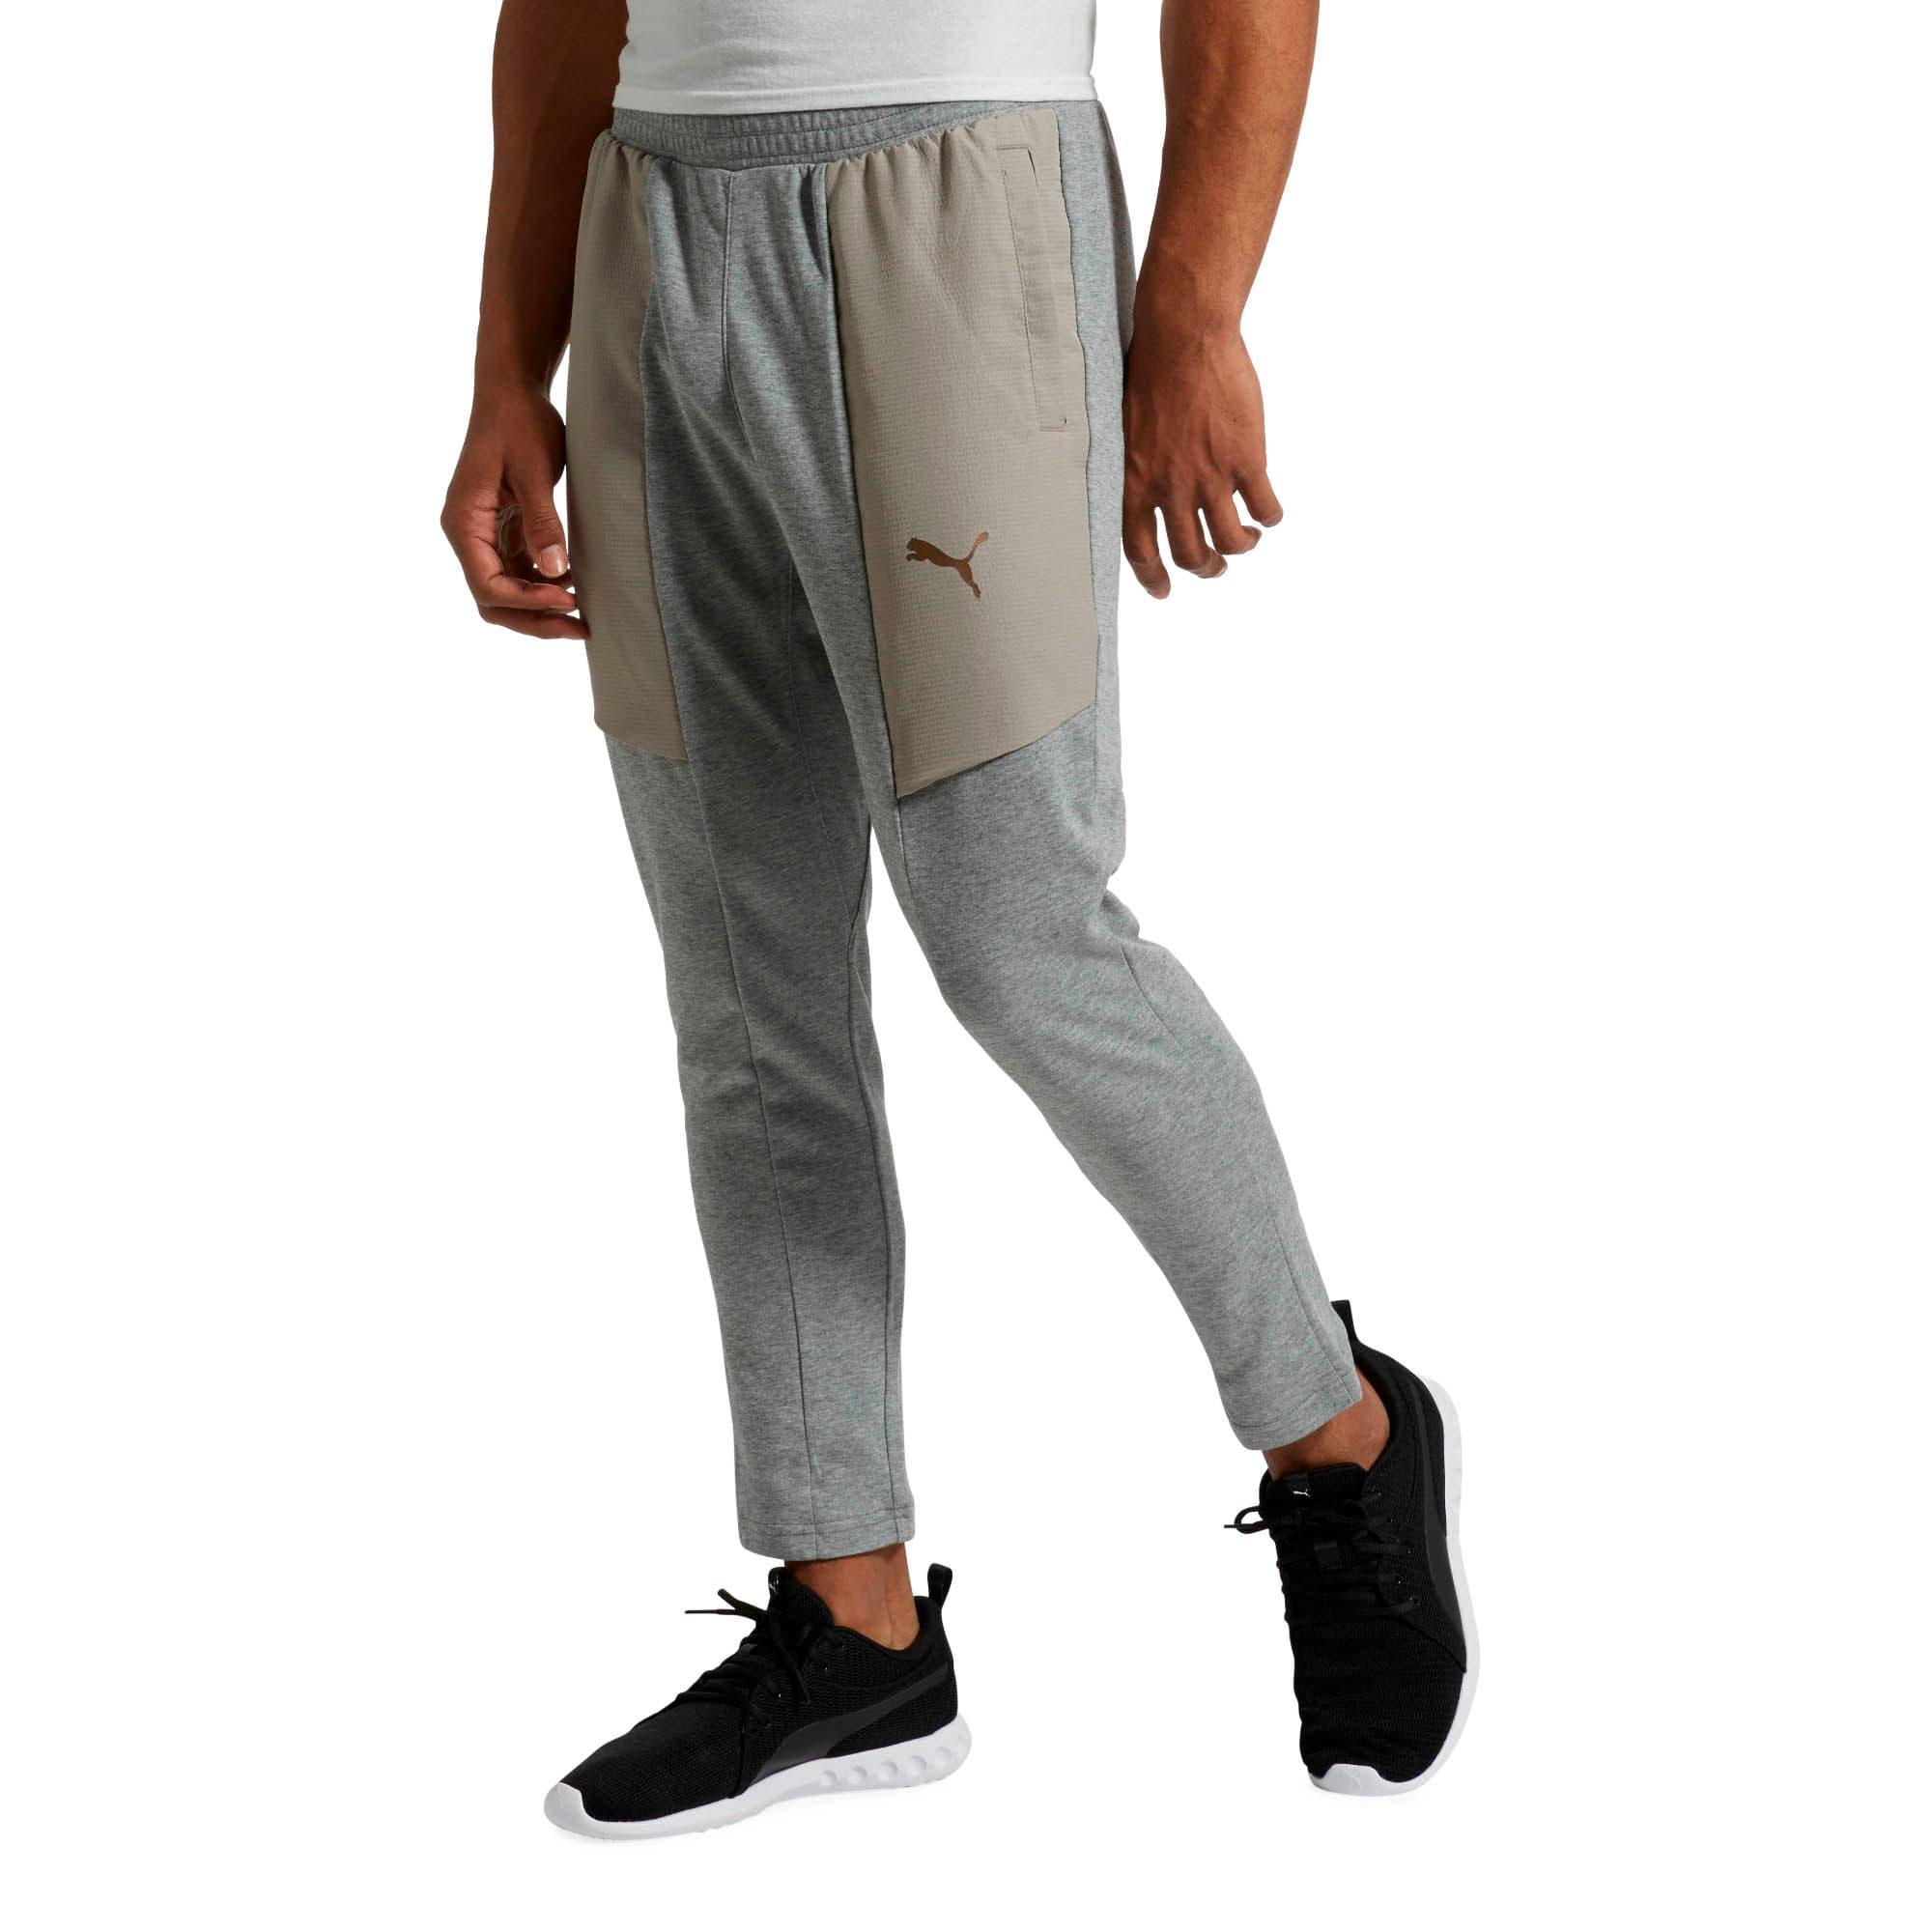 Thumbnail 2 of Energy Desert Tapered Men's Training Pants, Medium Gray Heather, medium